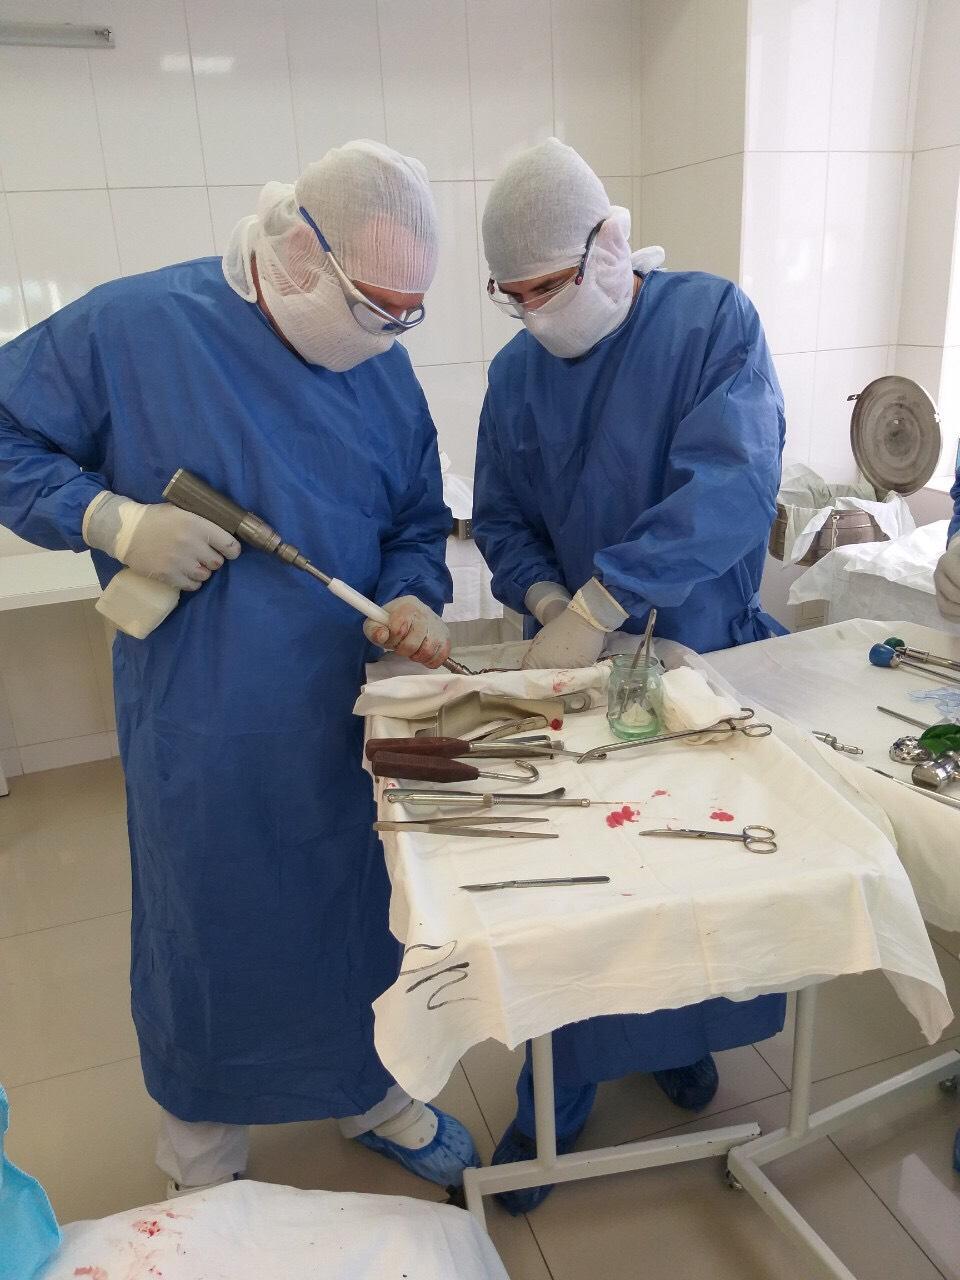 Эндопротезирование тазобедренного сустава - операция